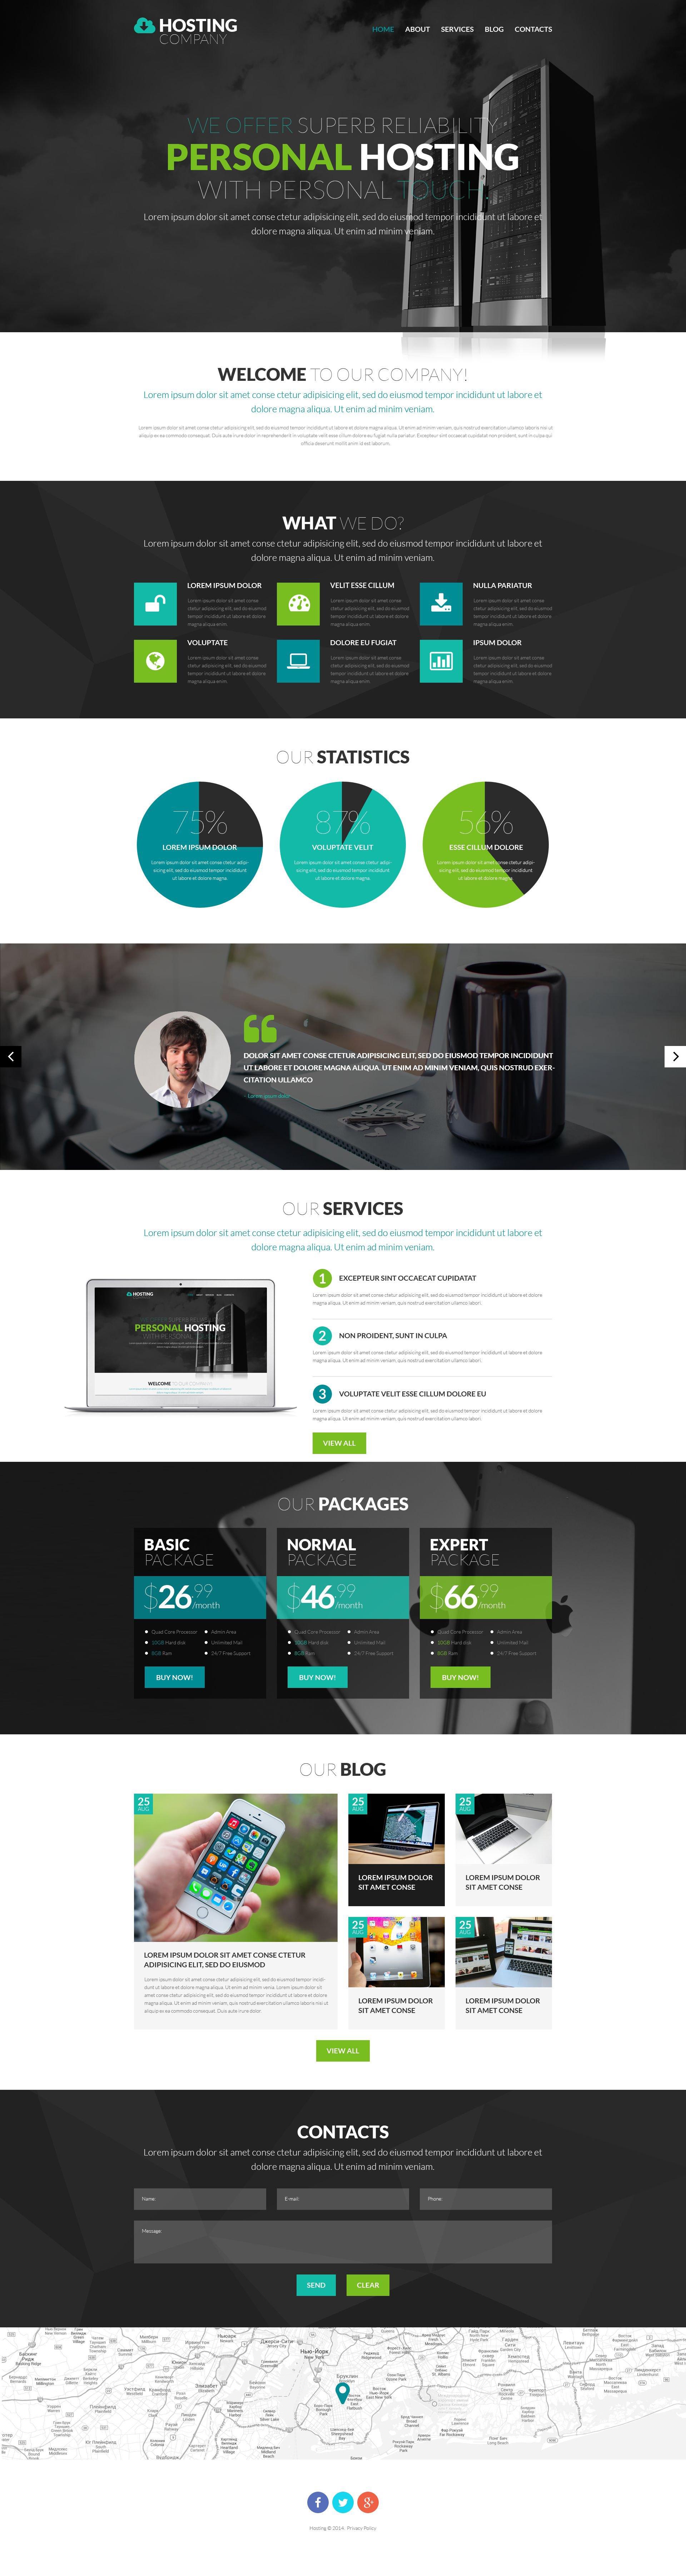 Responsivt Hosting Provider WordPress-tema #53367